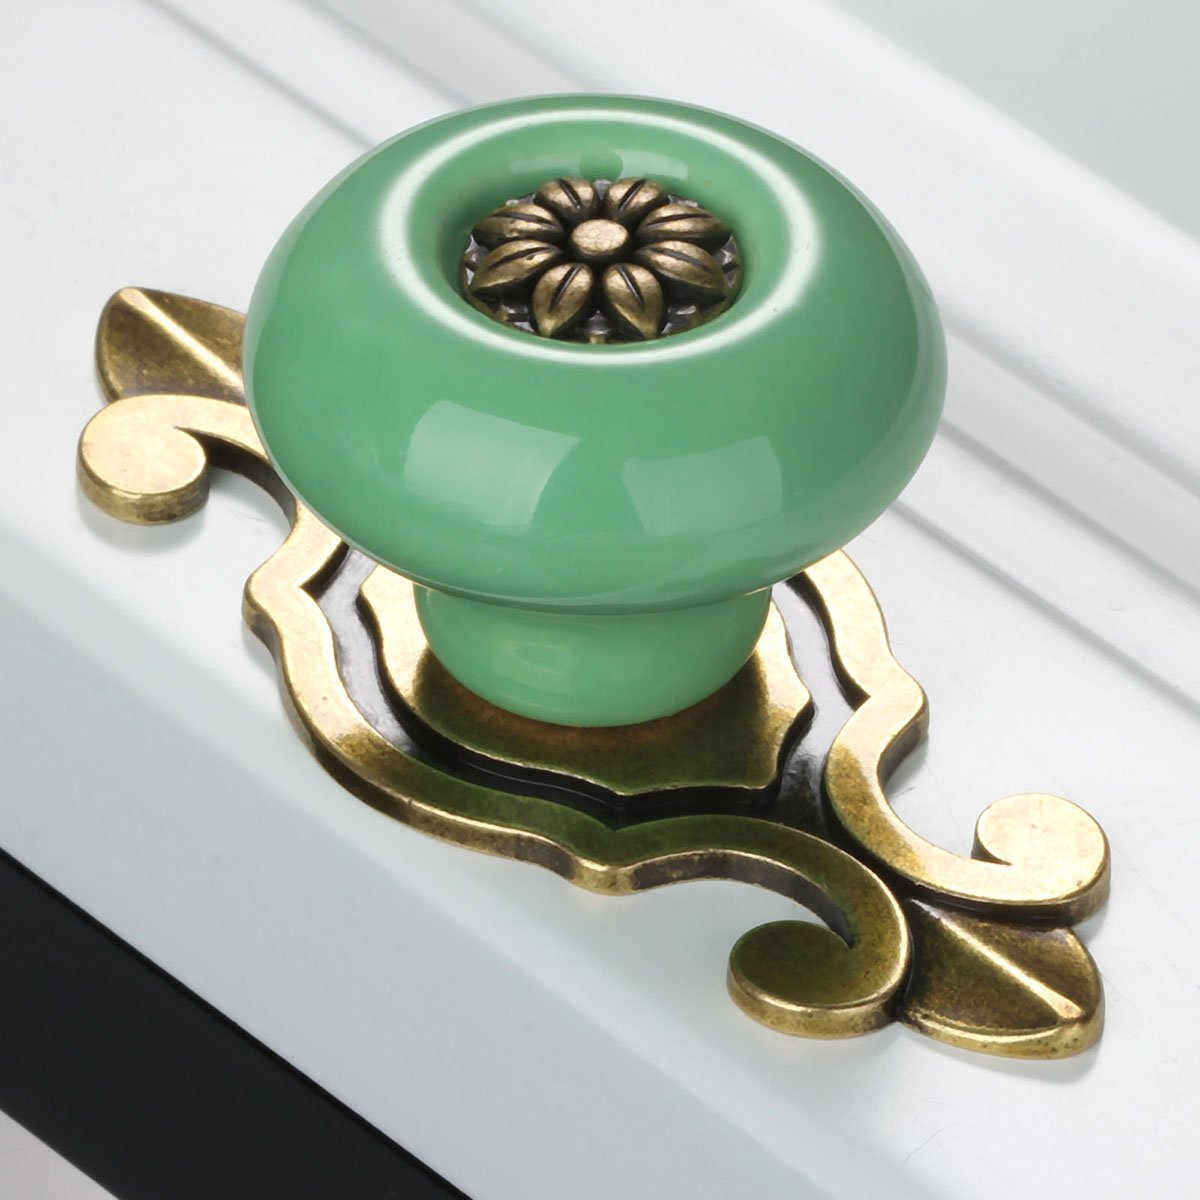 Green-Bronze Corasays 2 in 1 Vintage Ceramic Drawer Cabinet Knobs and Pulls for DIY Home Furniture Cabinet Dresser Cupboard Bin Door Handles Pack of 8